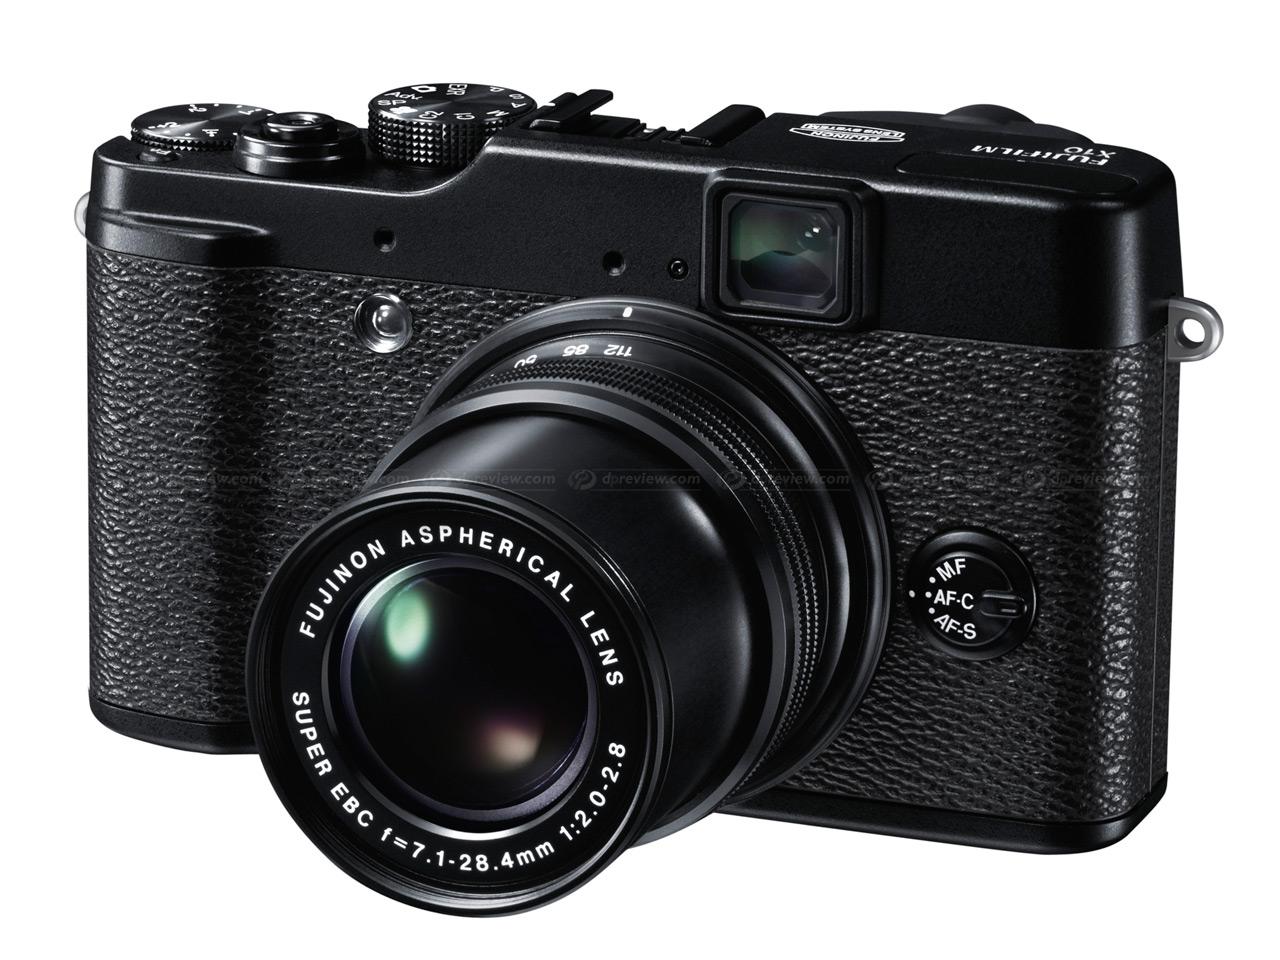 fujifilm announces pricing and availability of the x10 enthusiast rh dpreview com Custom Fuji X10 Fuji X10 Macro